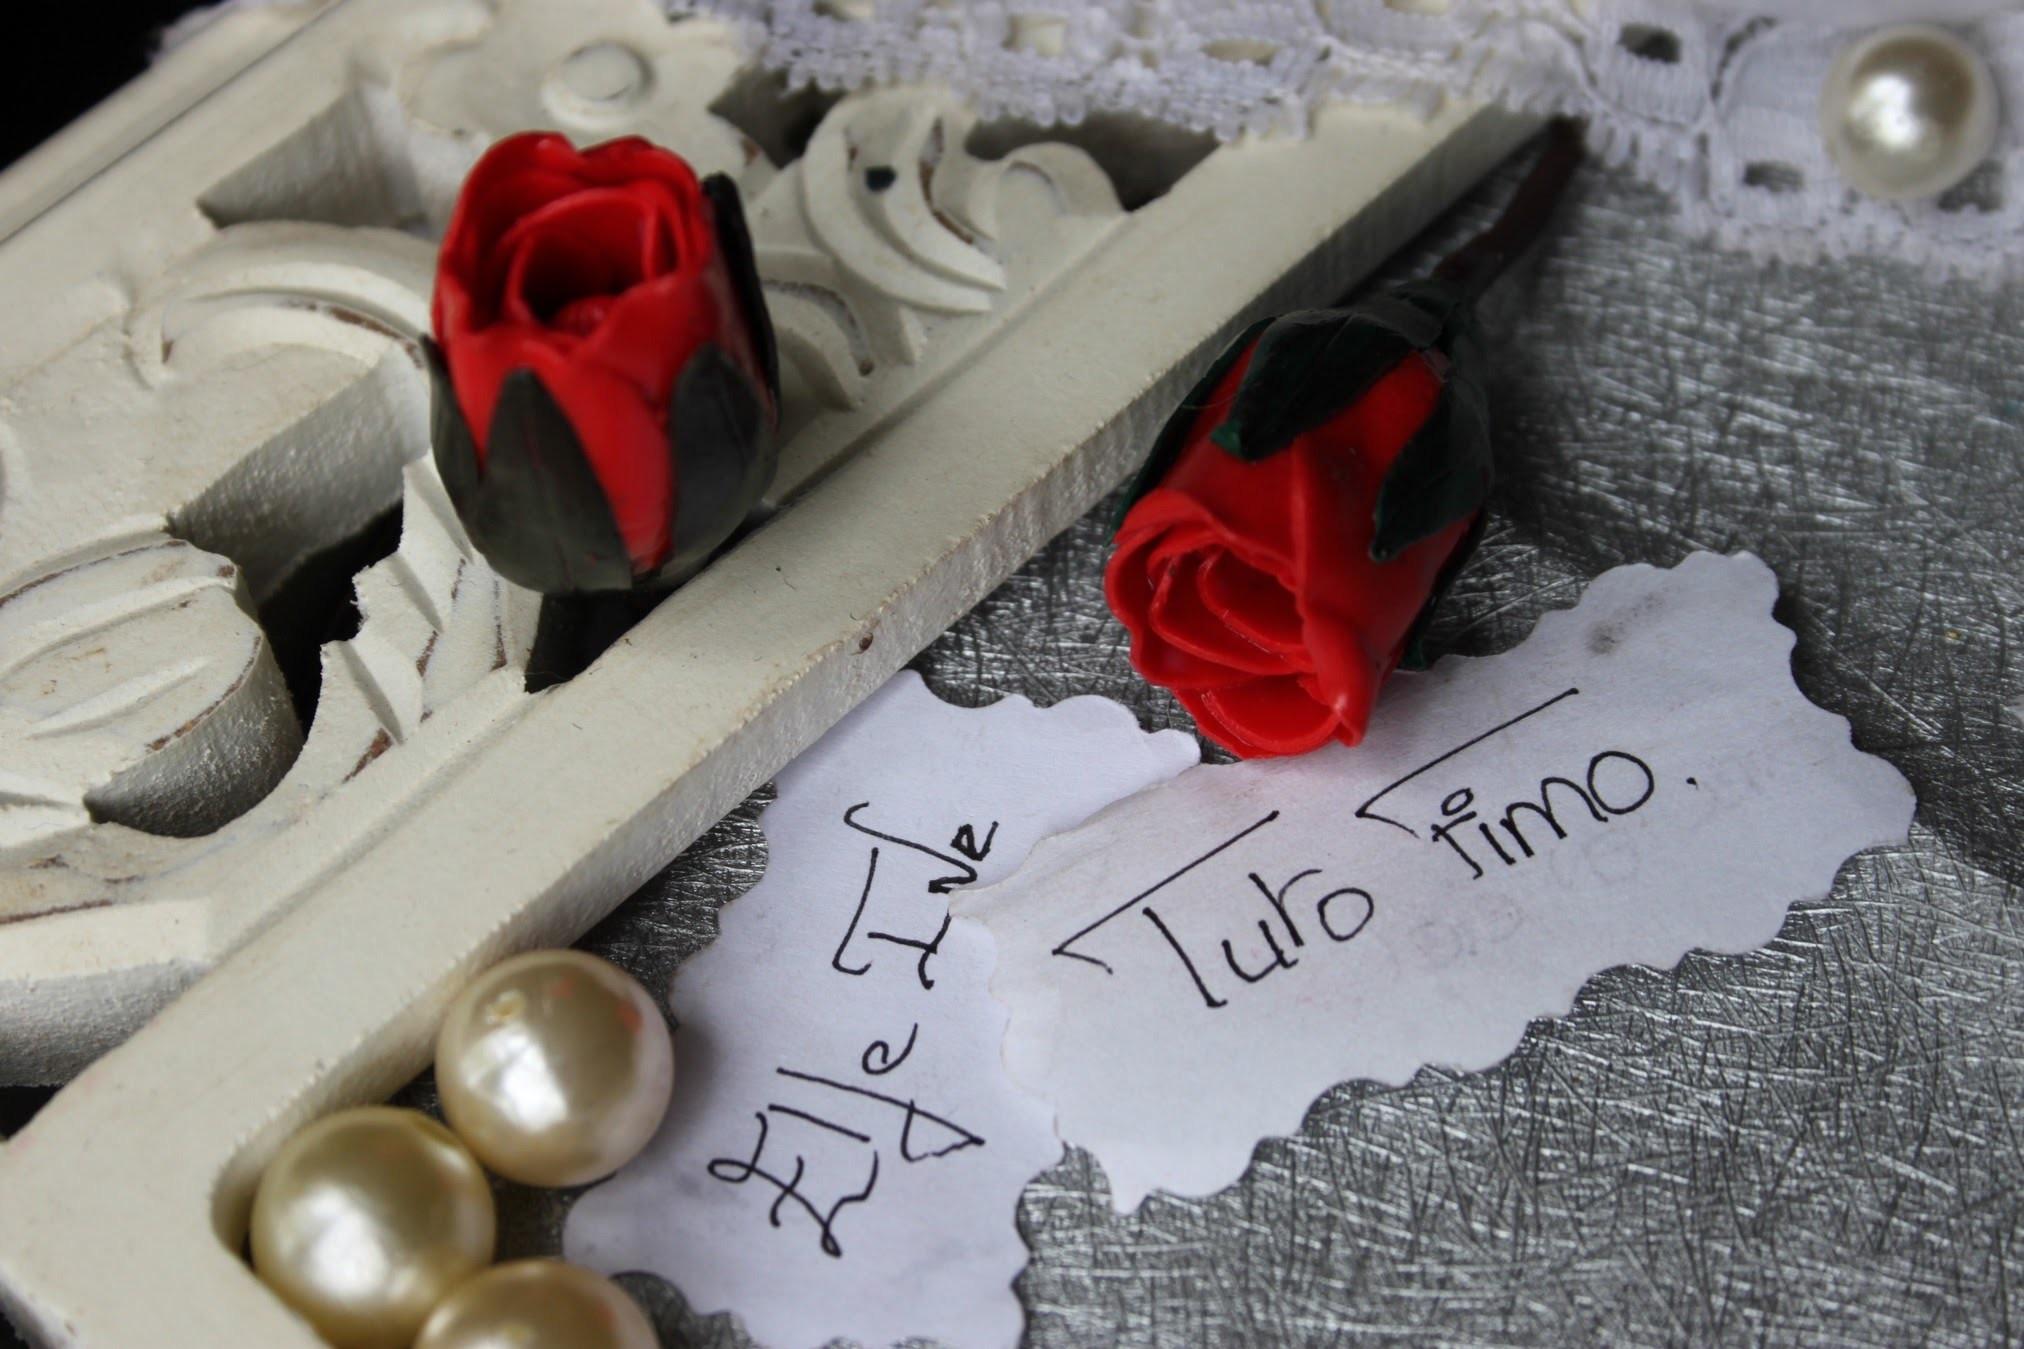 [♥✿ Tuto Fimo : Bouton de rose ✿♥] ~ [♥✿ Polymer Clay Tutorial : Rosebud ✿♥]